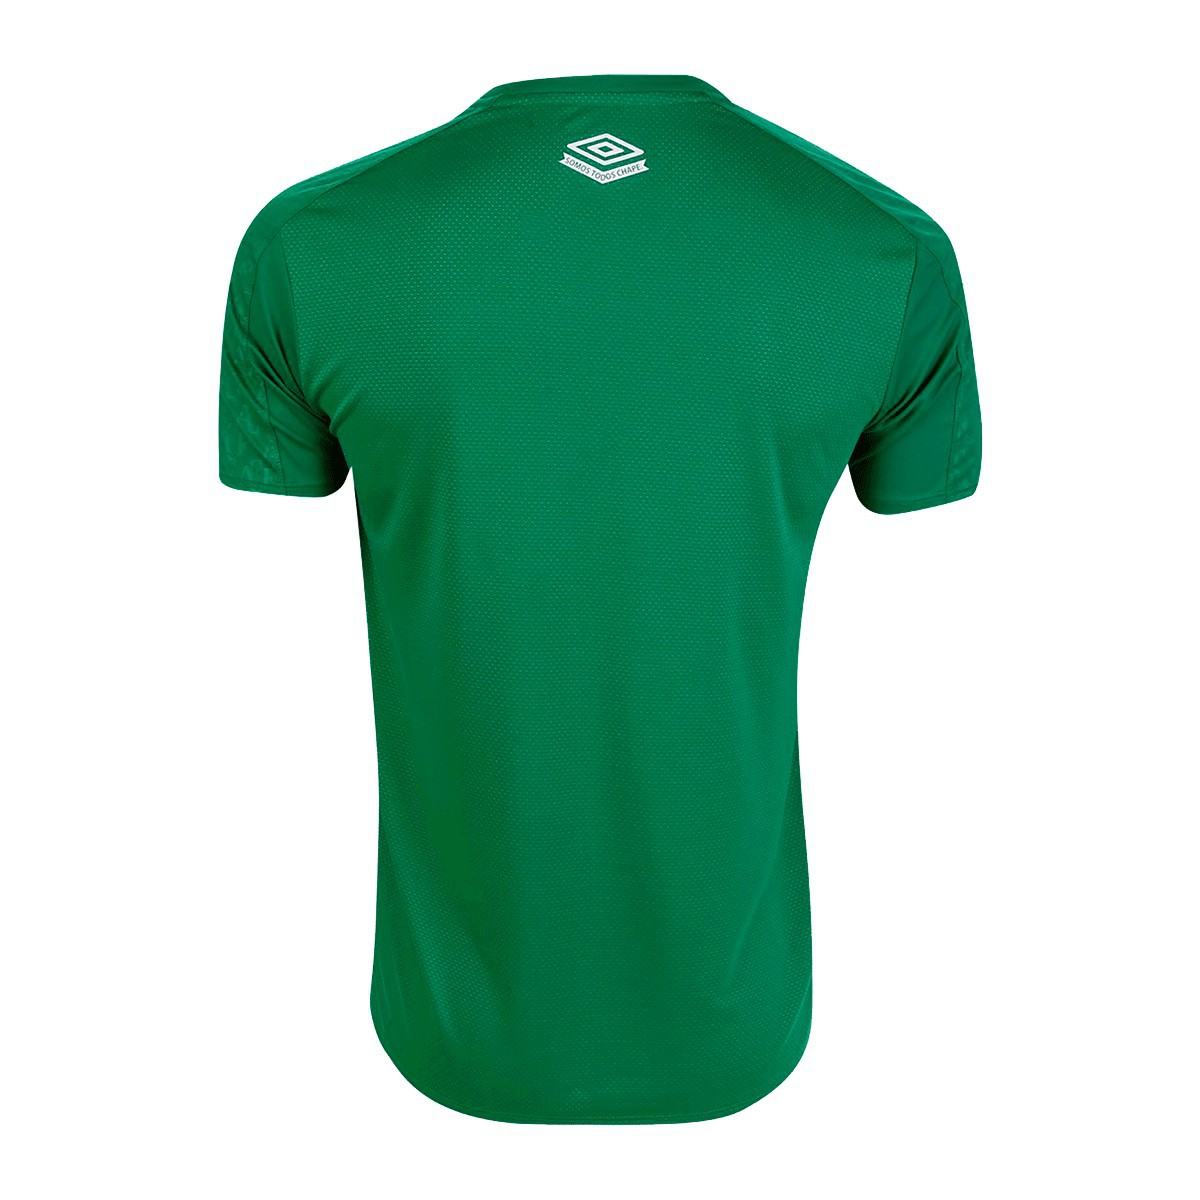 Camisa Chapecoense Umbro Home Masculino 19 20